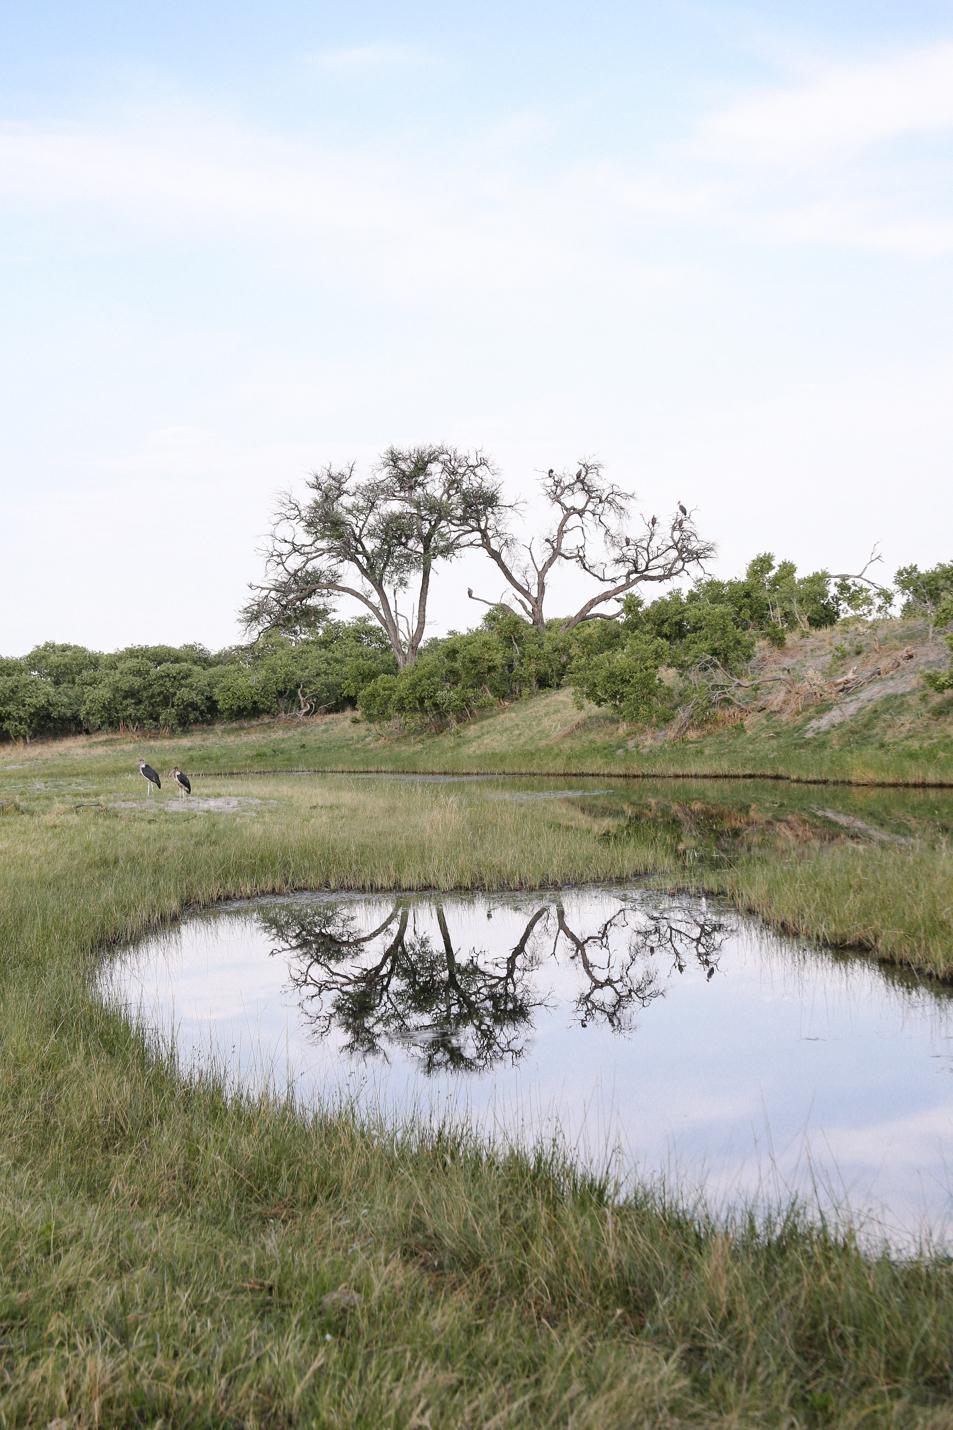 Africa - LindsayBrown -WEB-4827.jpg